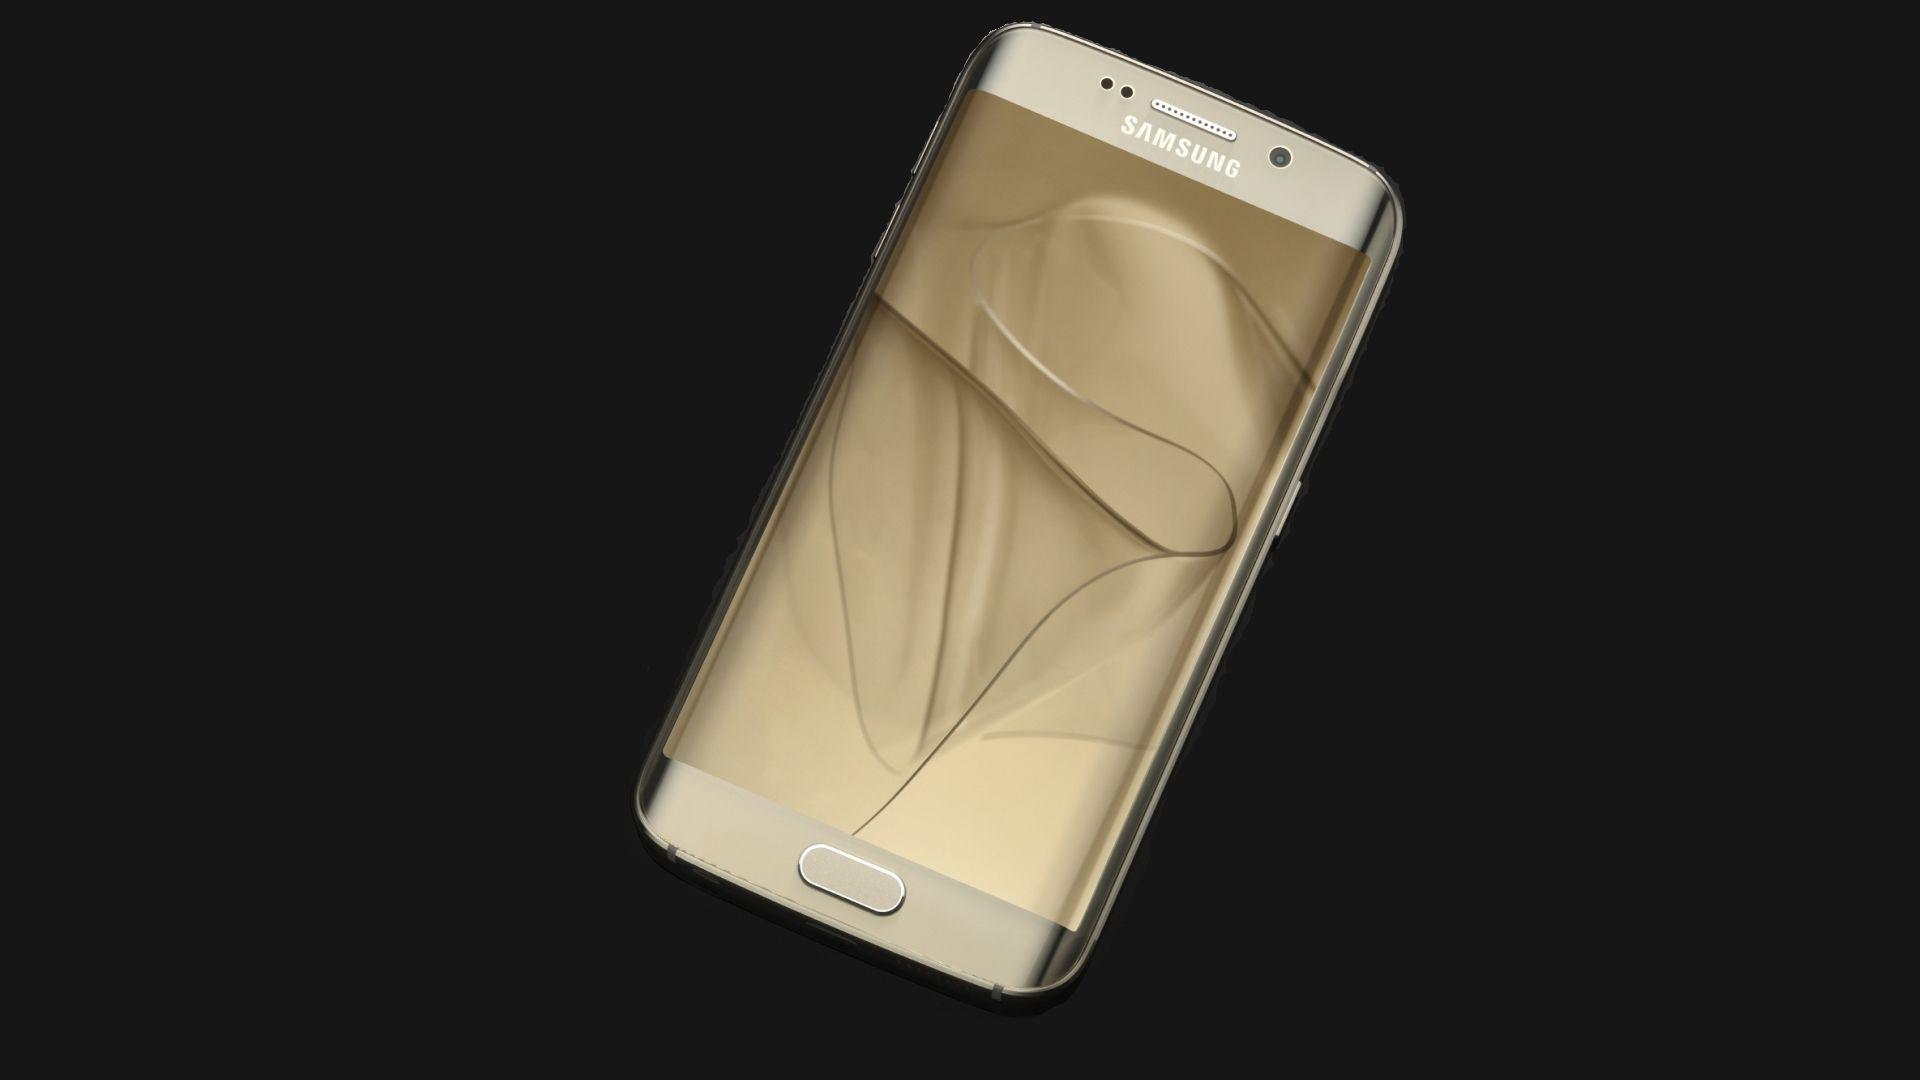 Galaxy S7 Wallpaper Hd 1080p 1920x1080 Wallpaper Teahub Io